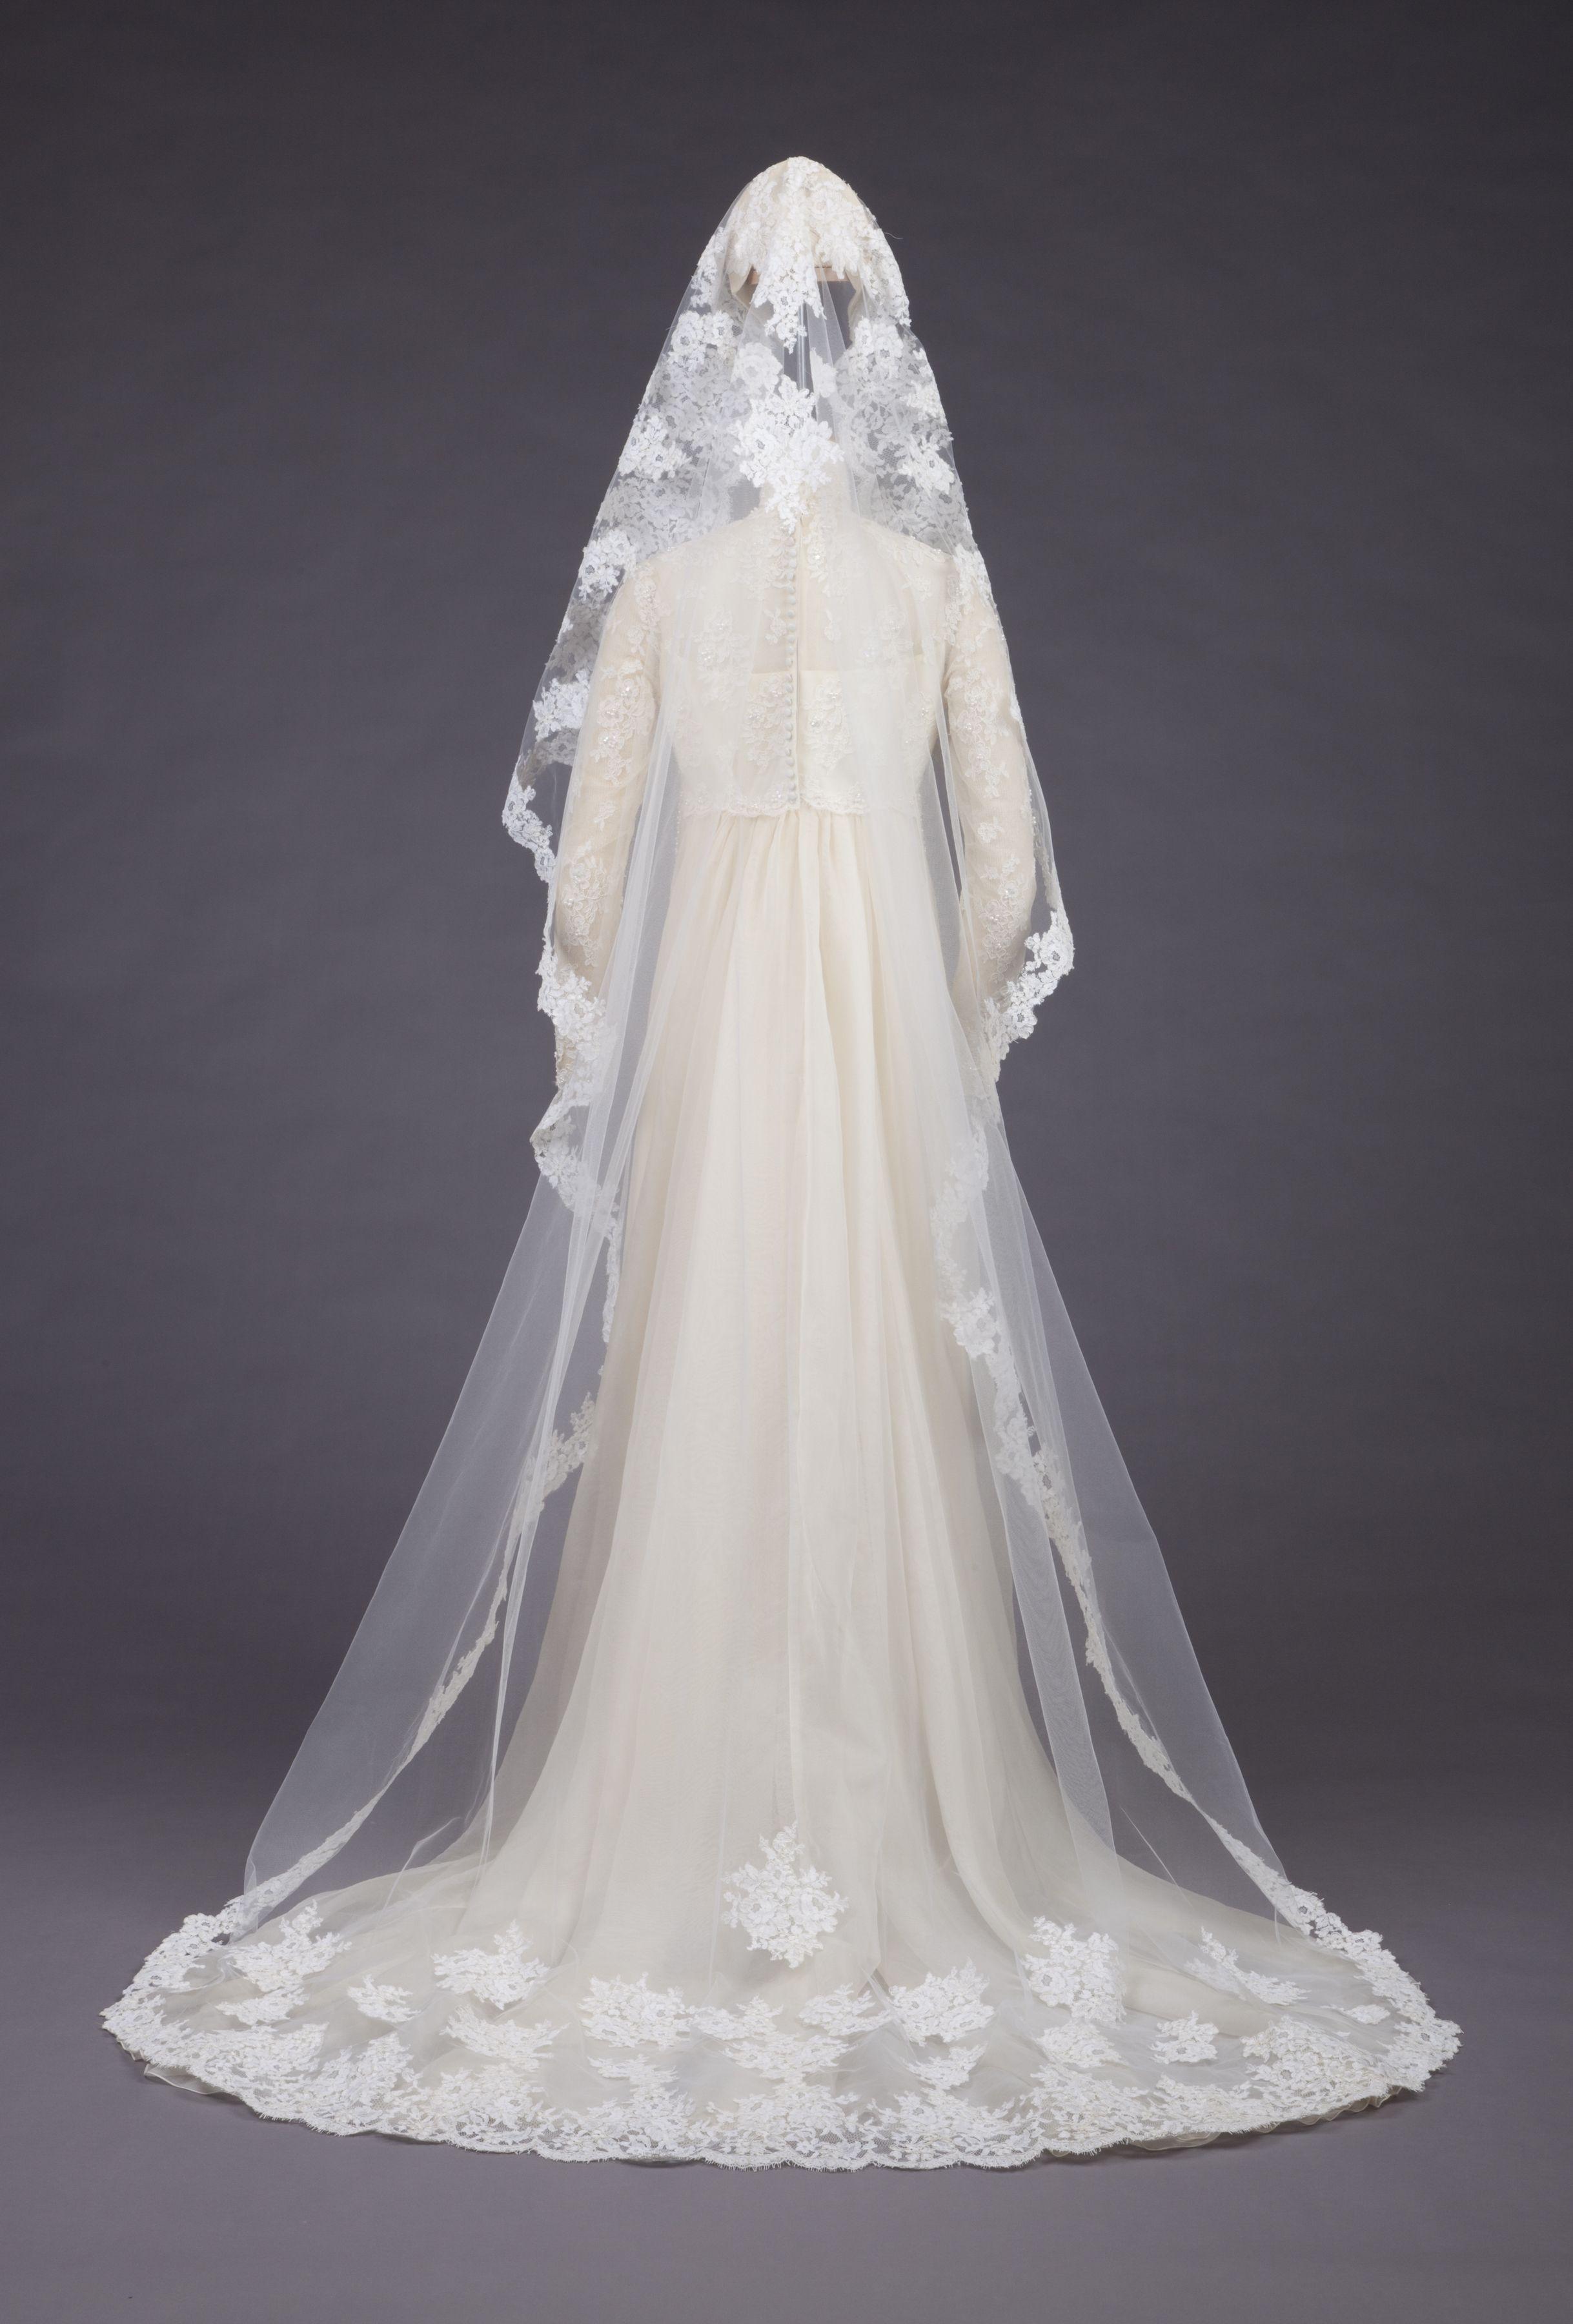 Wedding gown by priscilla of boston 1973 wedding for Priscilla of boston wedding dresses